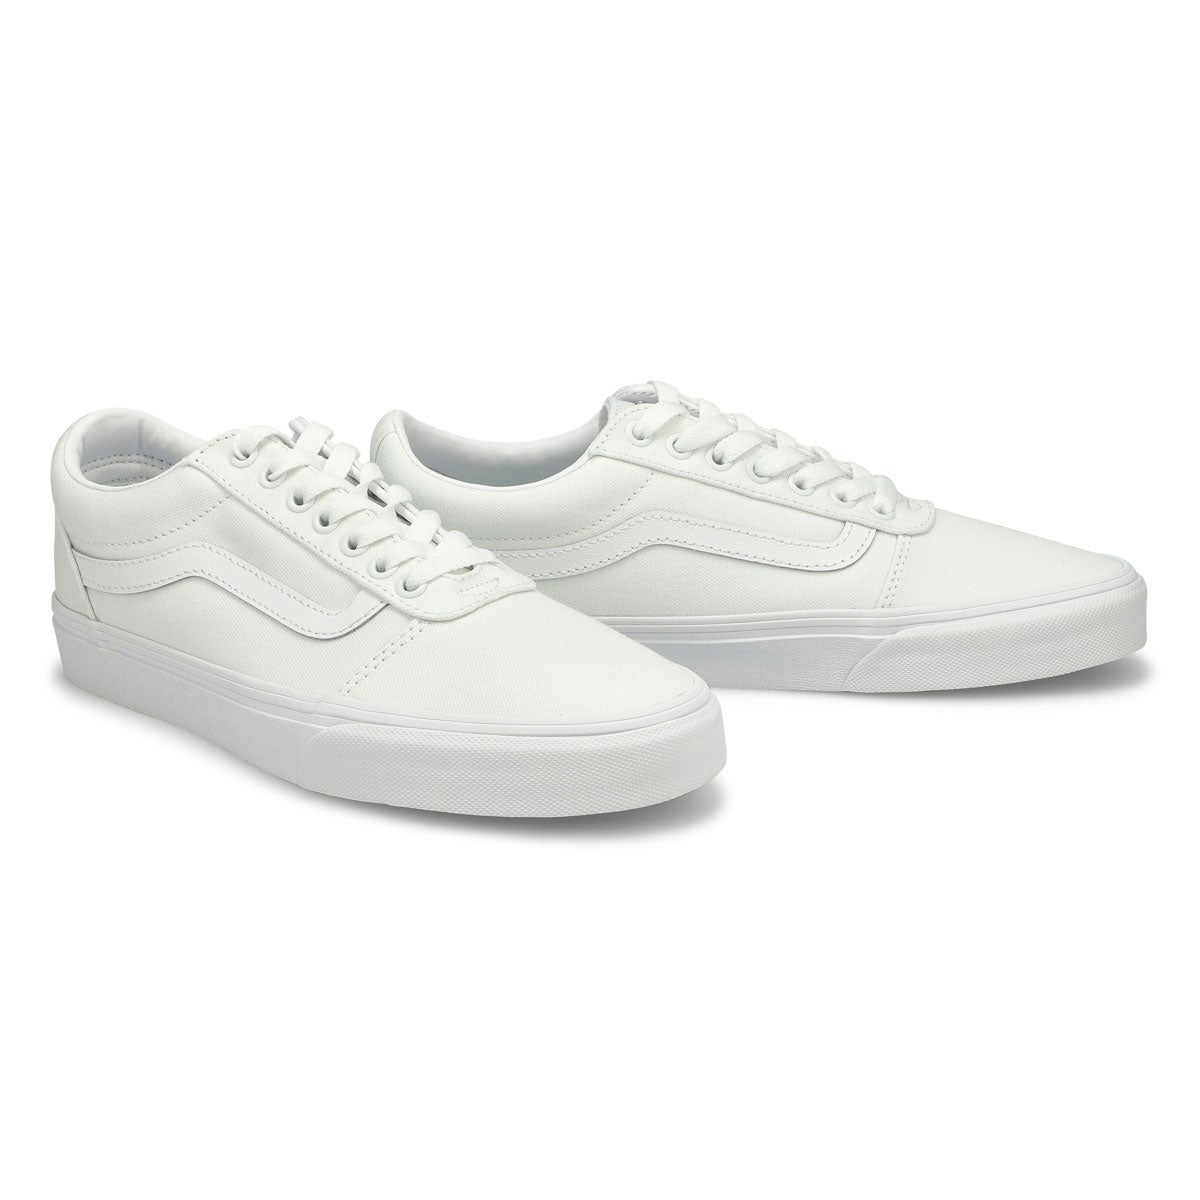 Mns Ward wht/wht lace up sneaker